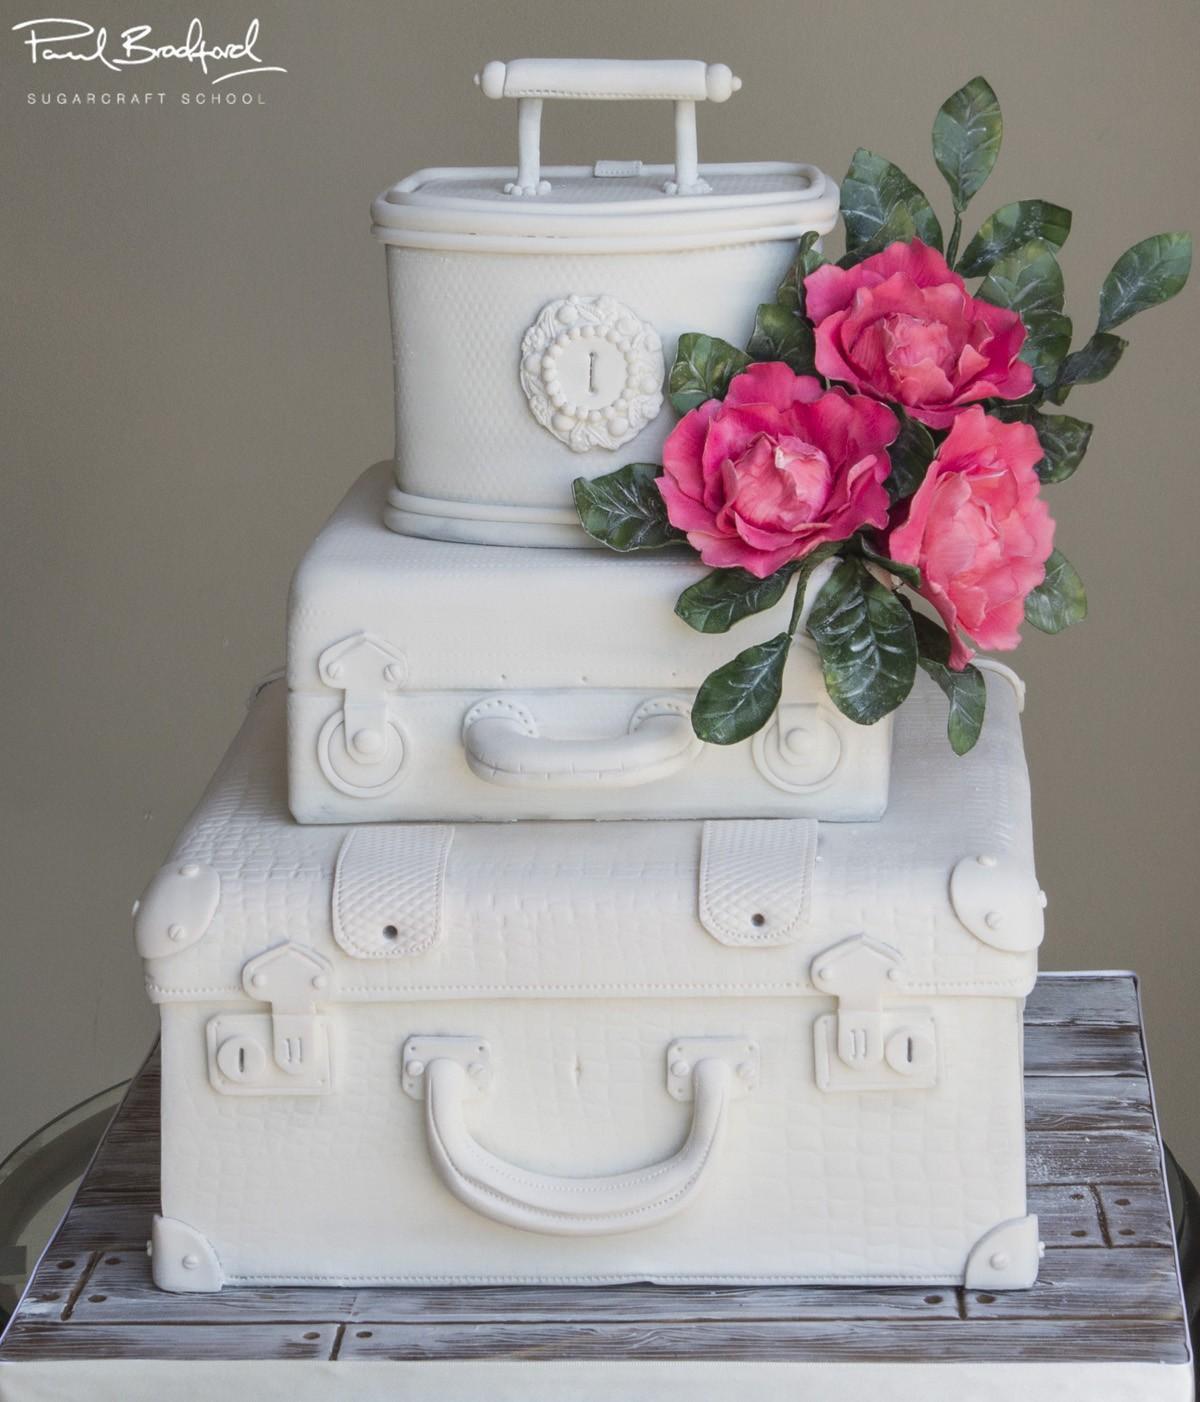 White Vintage Suitcase - CakeFlix